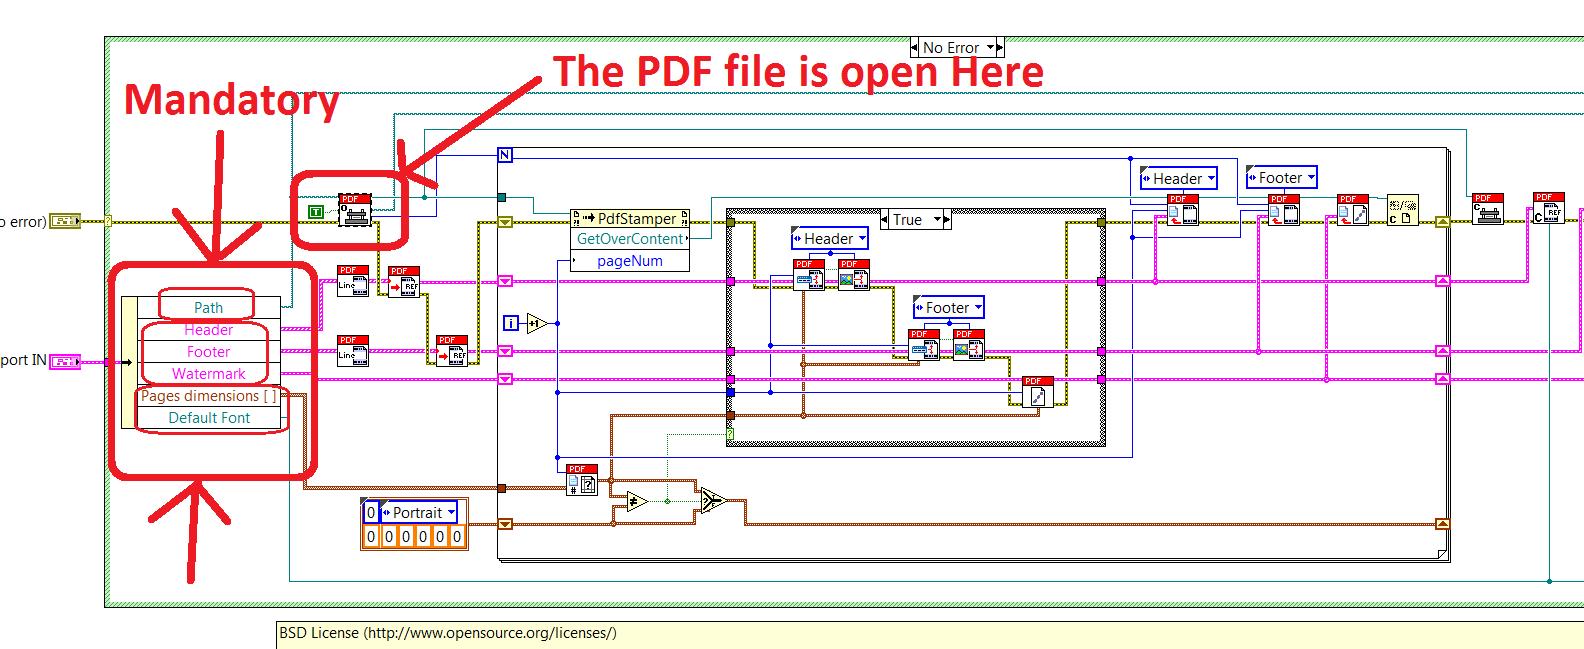 Concatenate PDF files with Exaprom iTextSharp - NI Community